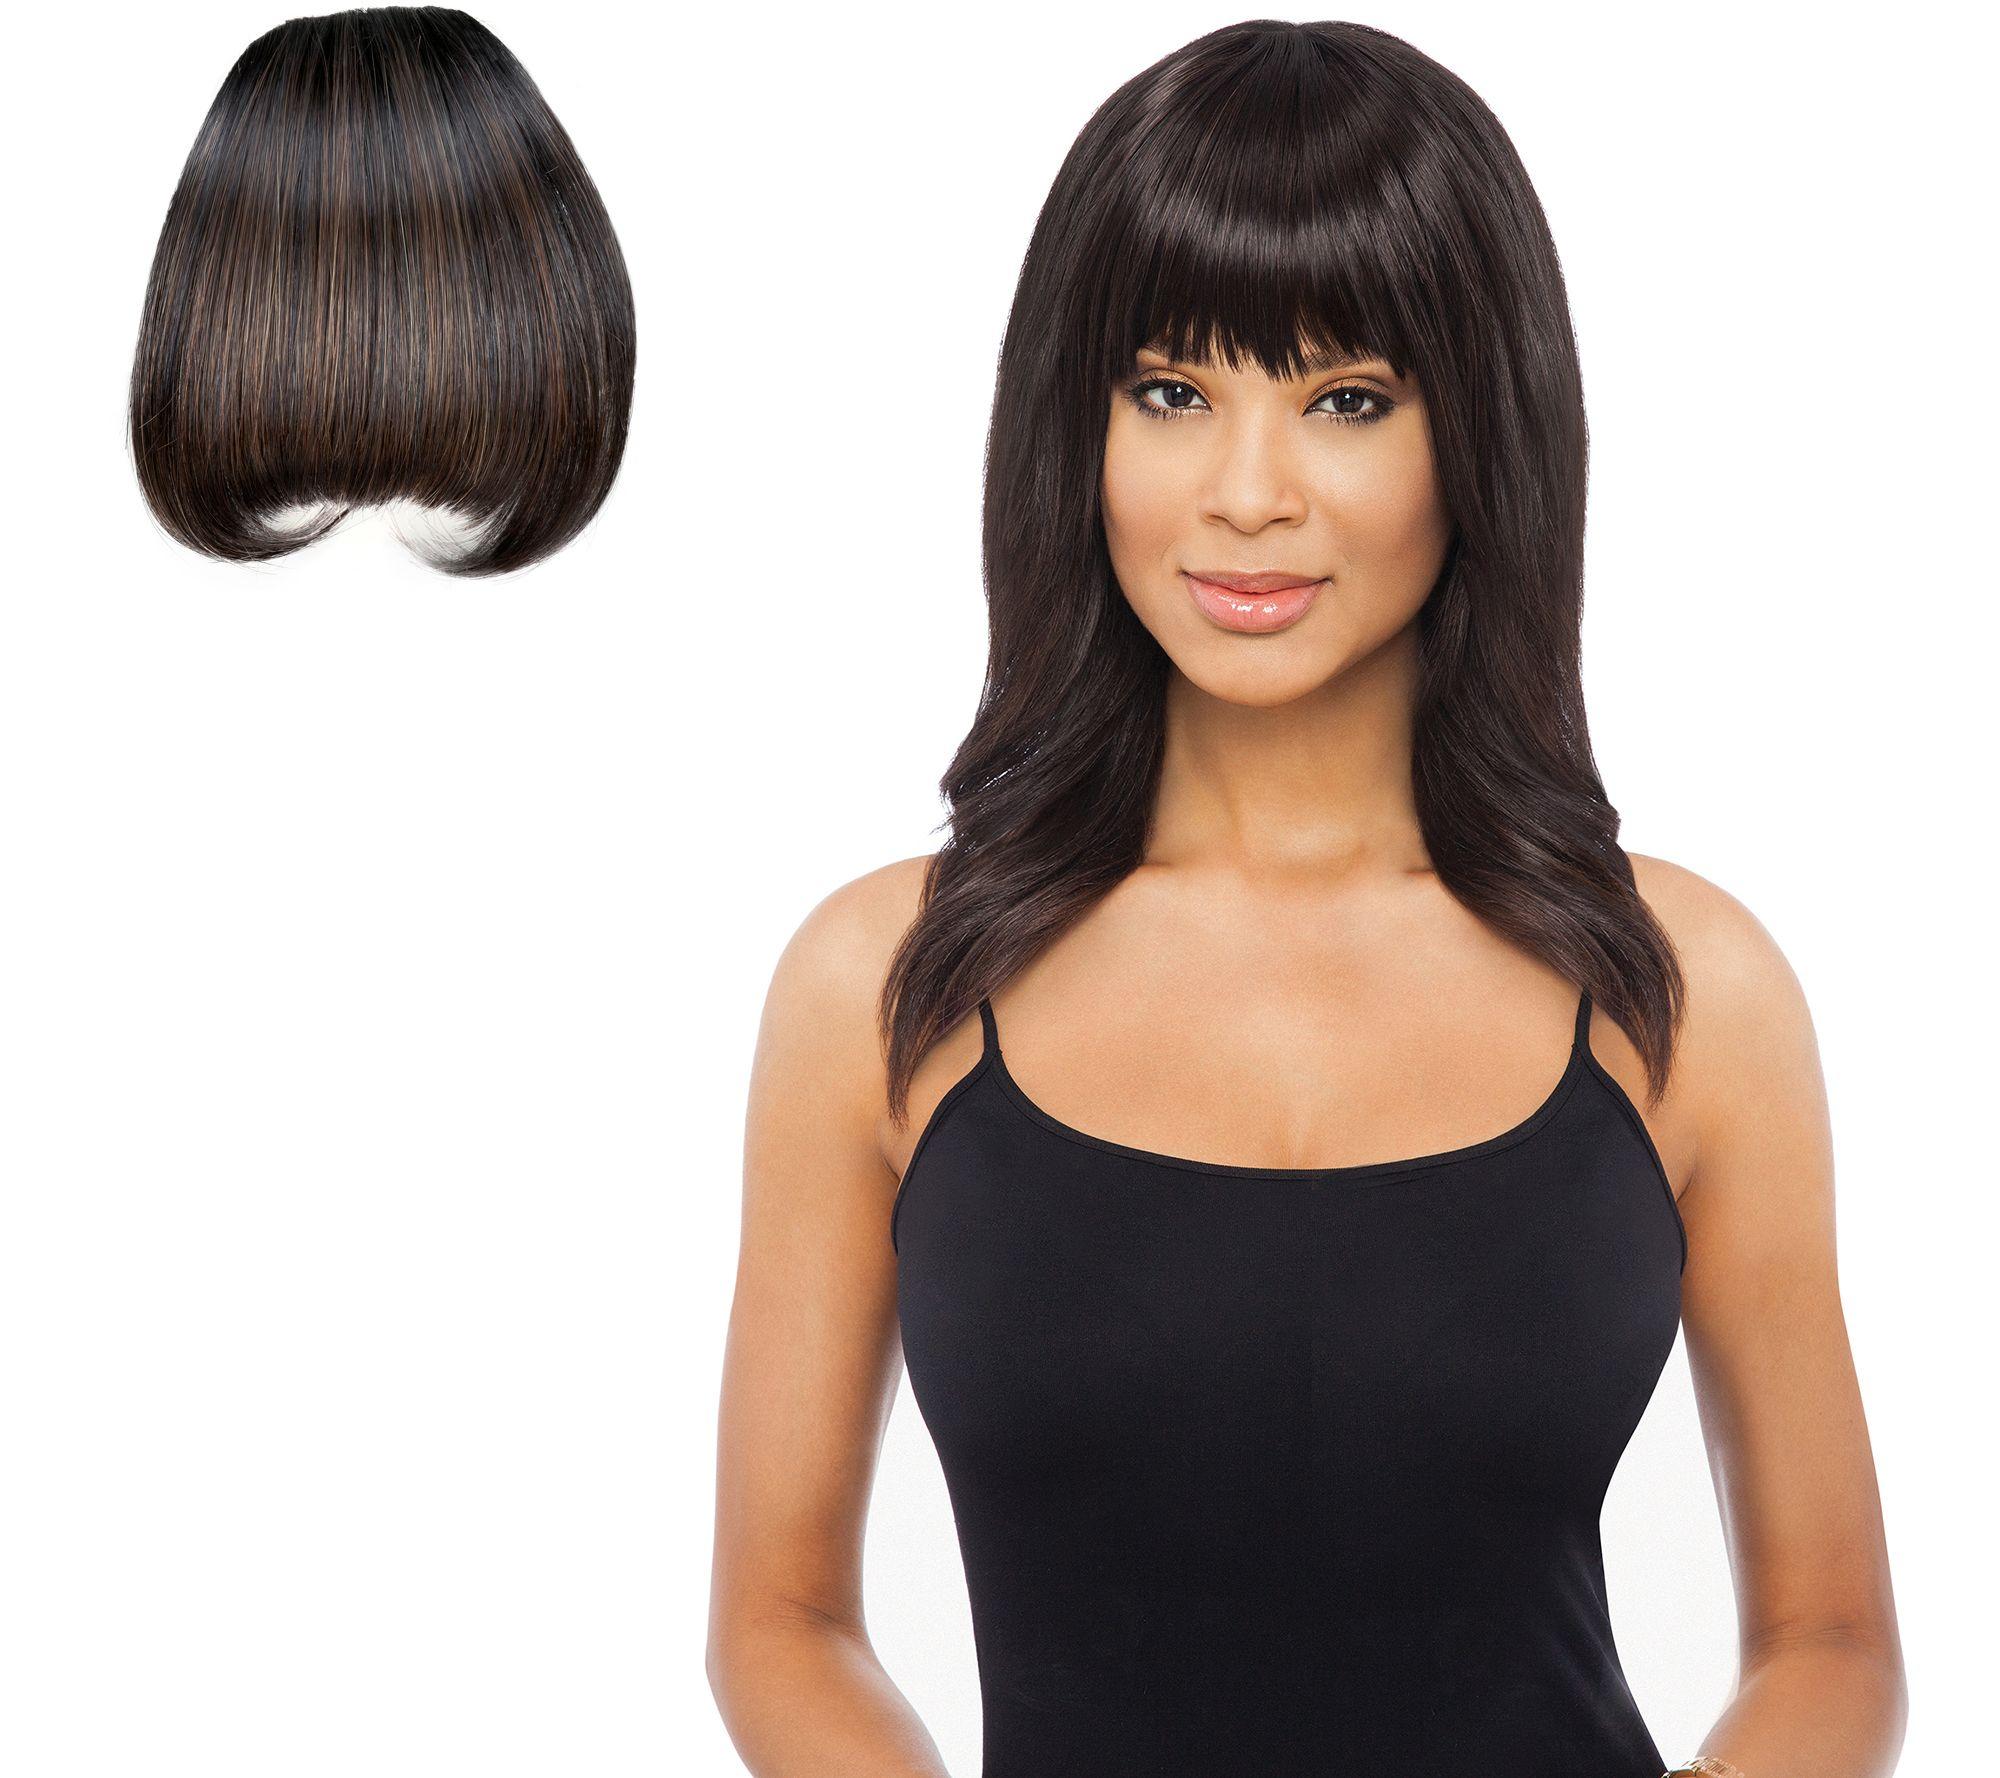 Luxury Raquel Welch Hairstyles Hairstyle Ideas